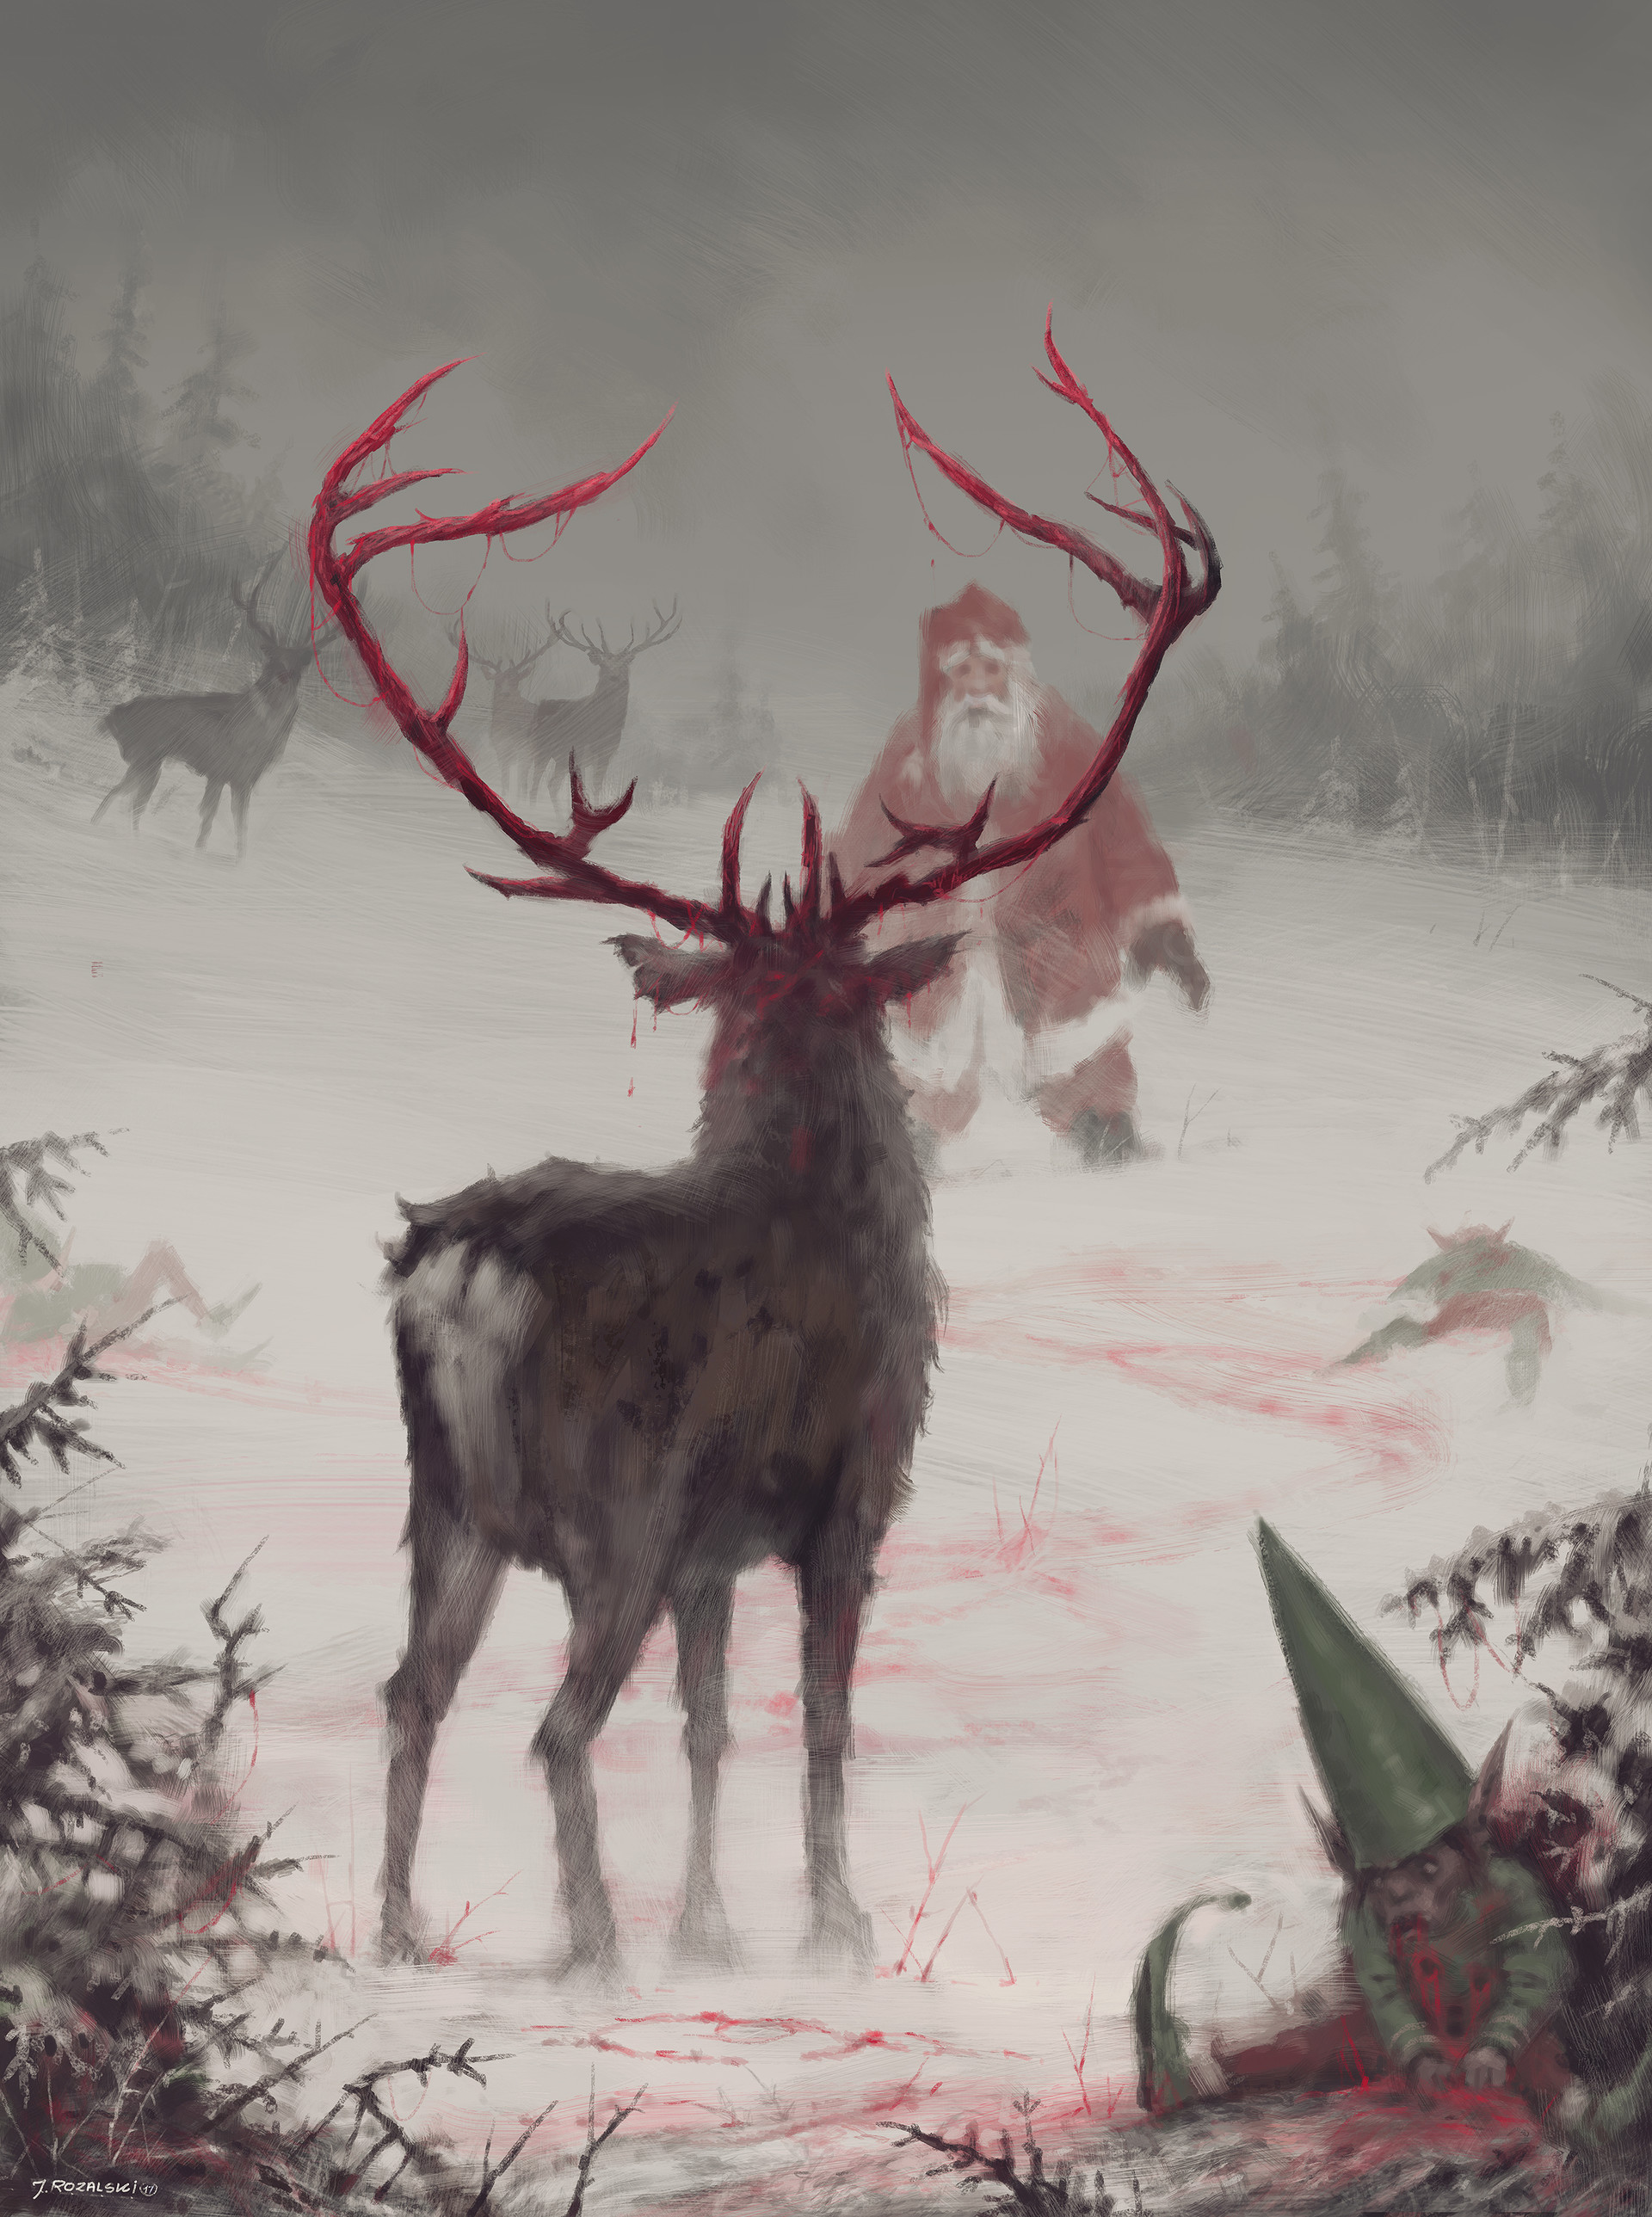 Winter Animal Wallpaper Artstation Rudolph Uprising Jakub Rozalski